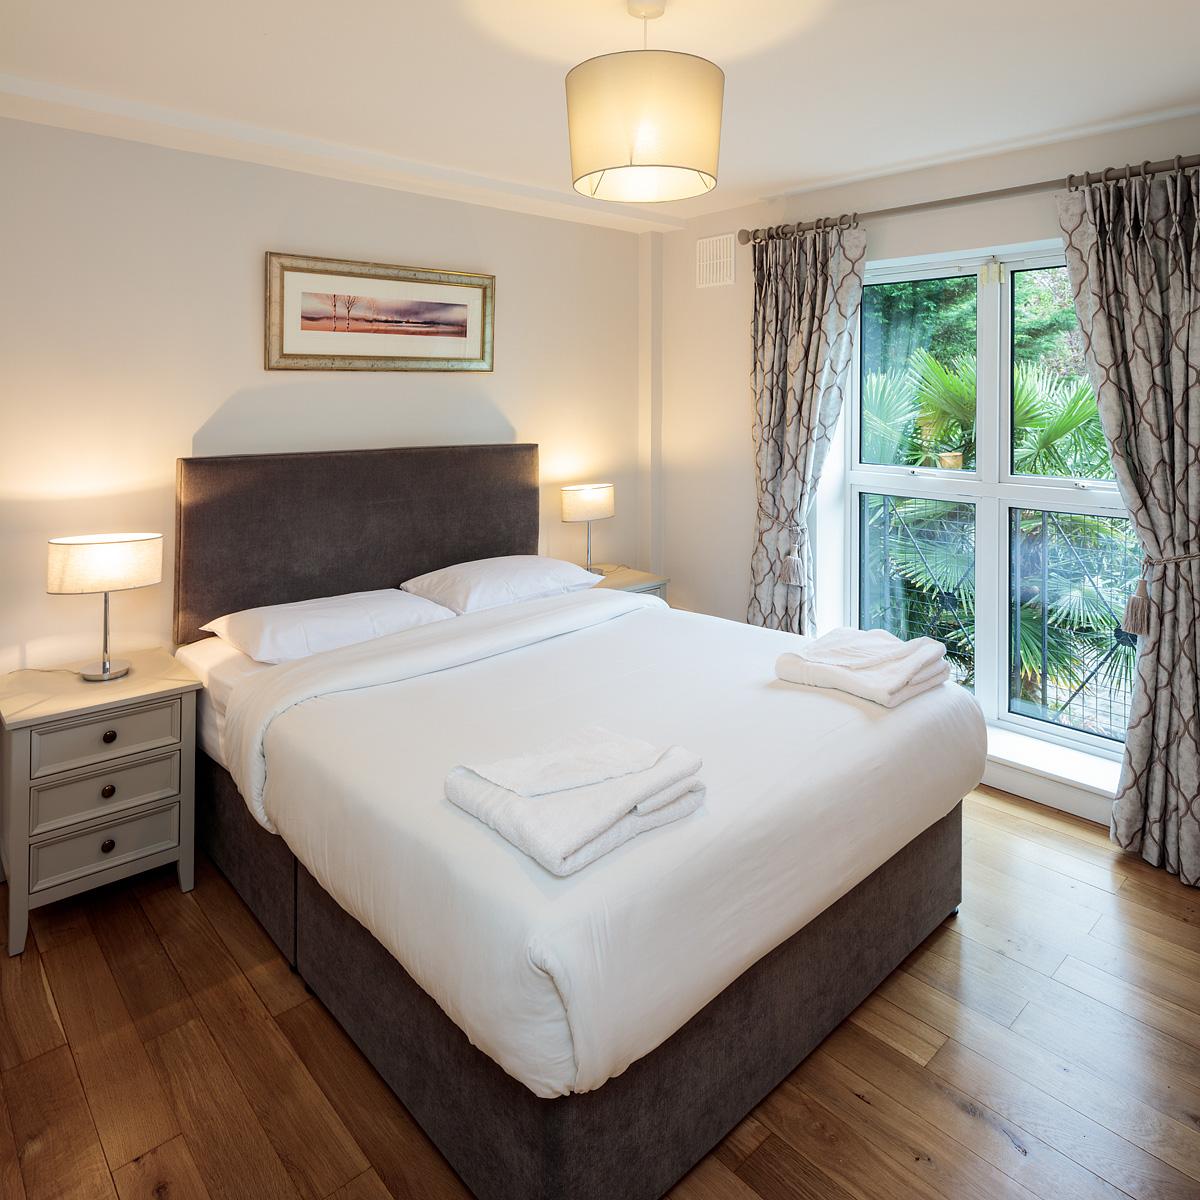 Bright bedroom at Baggot Rath House Apartments, Ballsbridge, Dublin